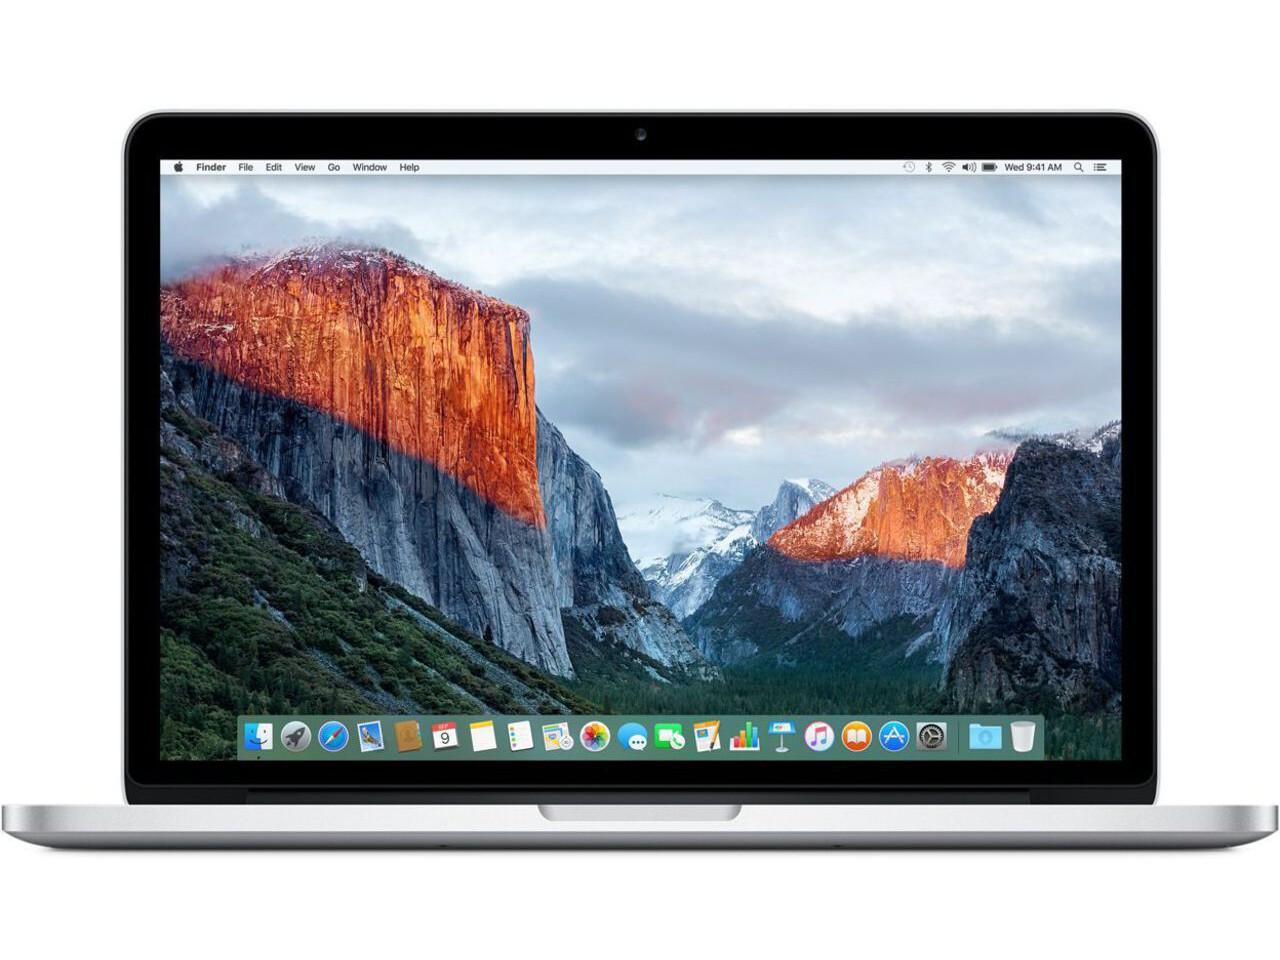 macbook pro 13 inch 2015 silver